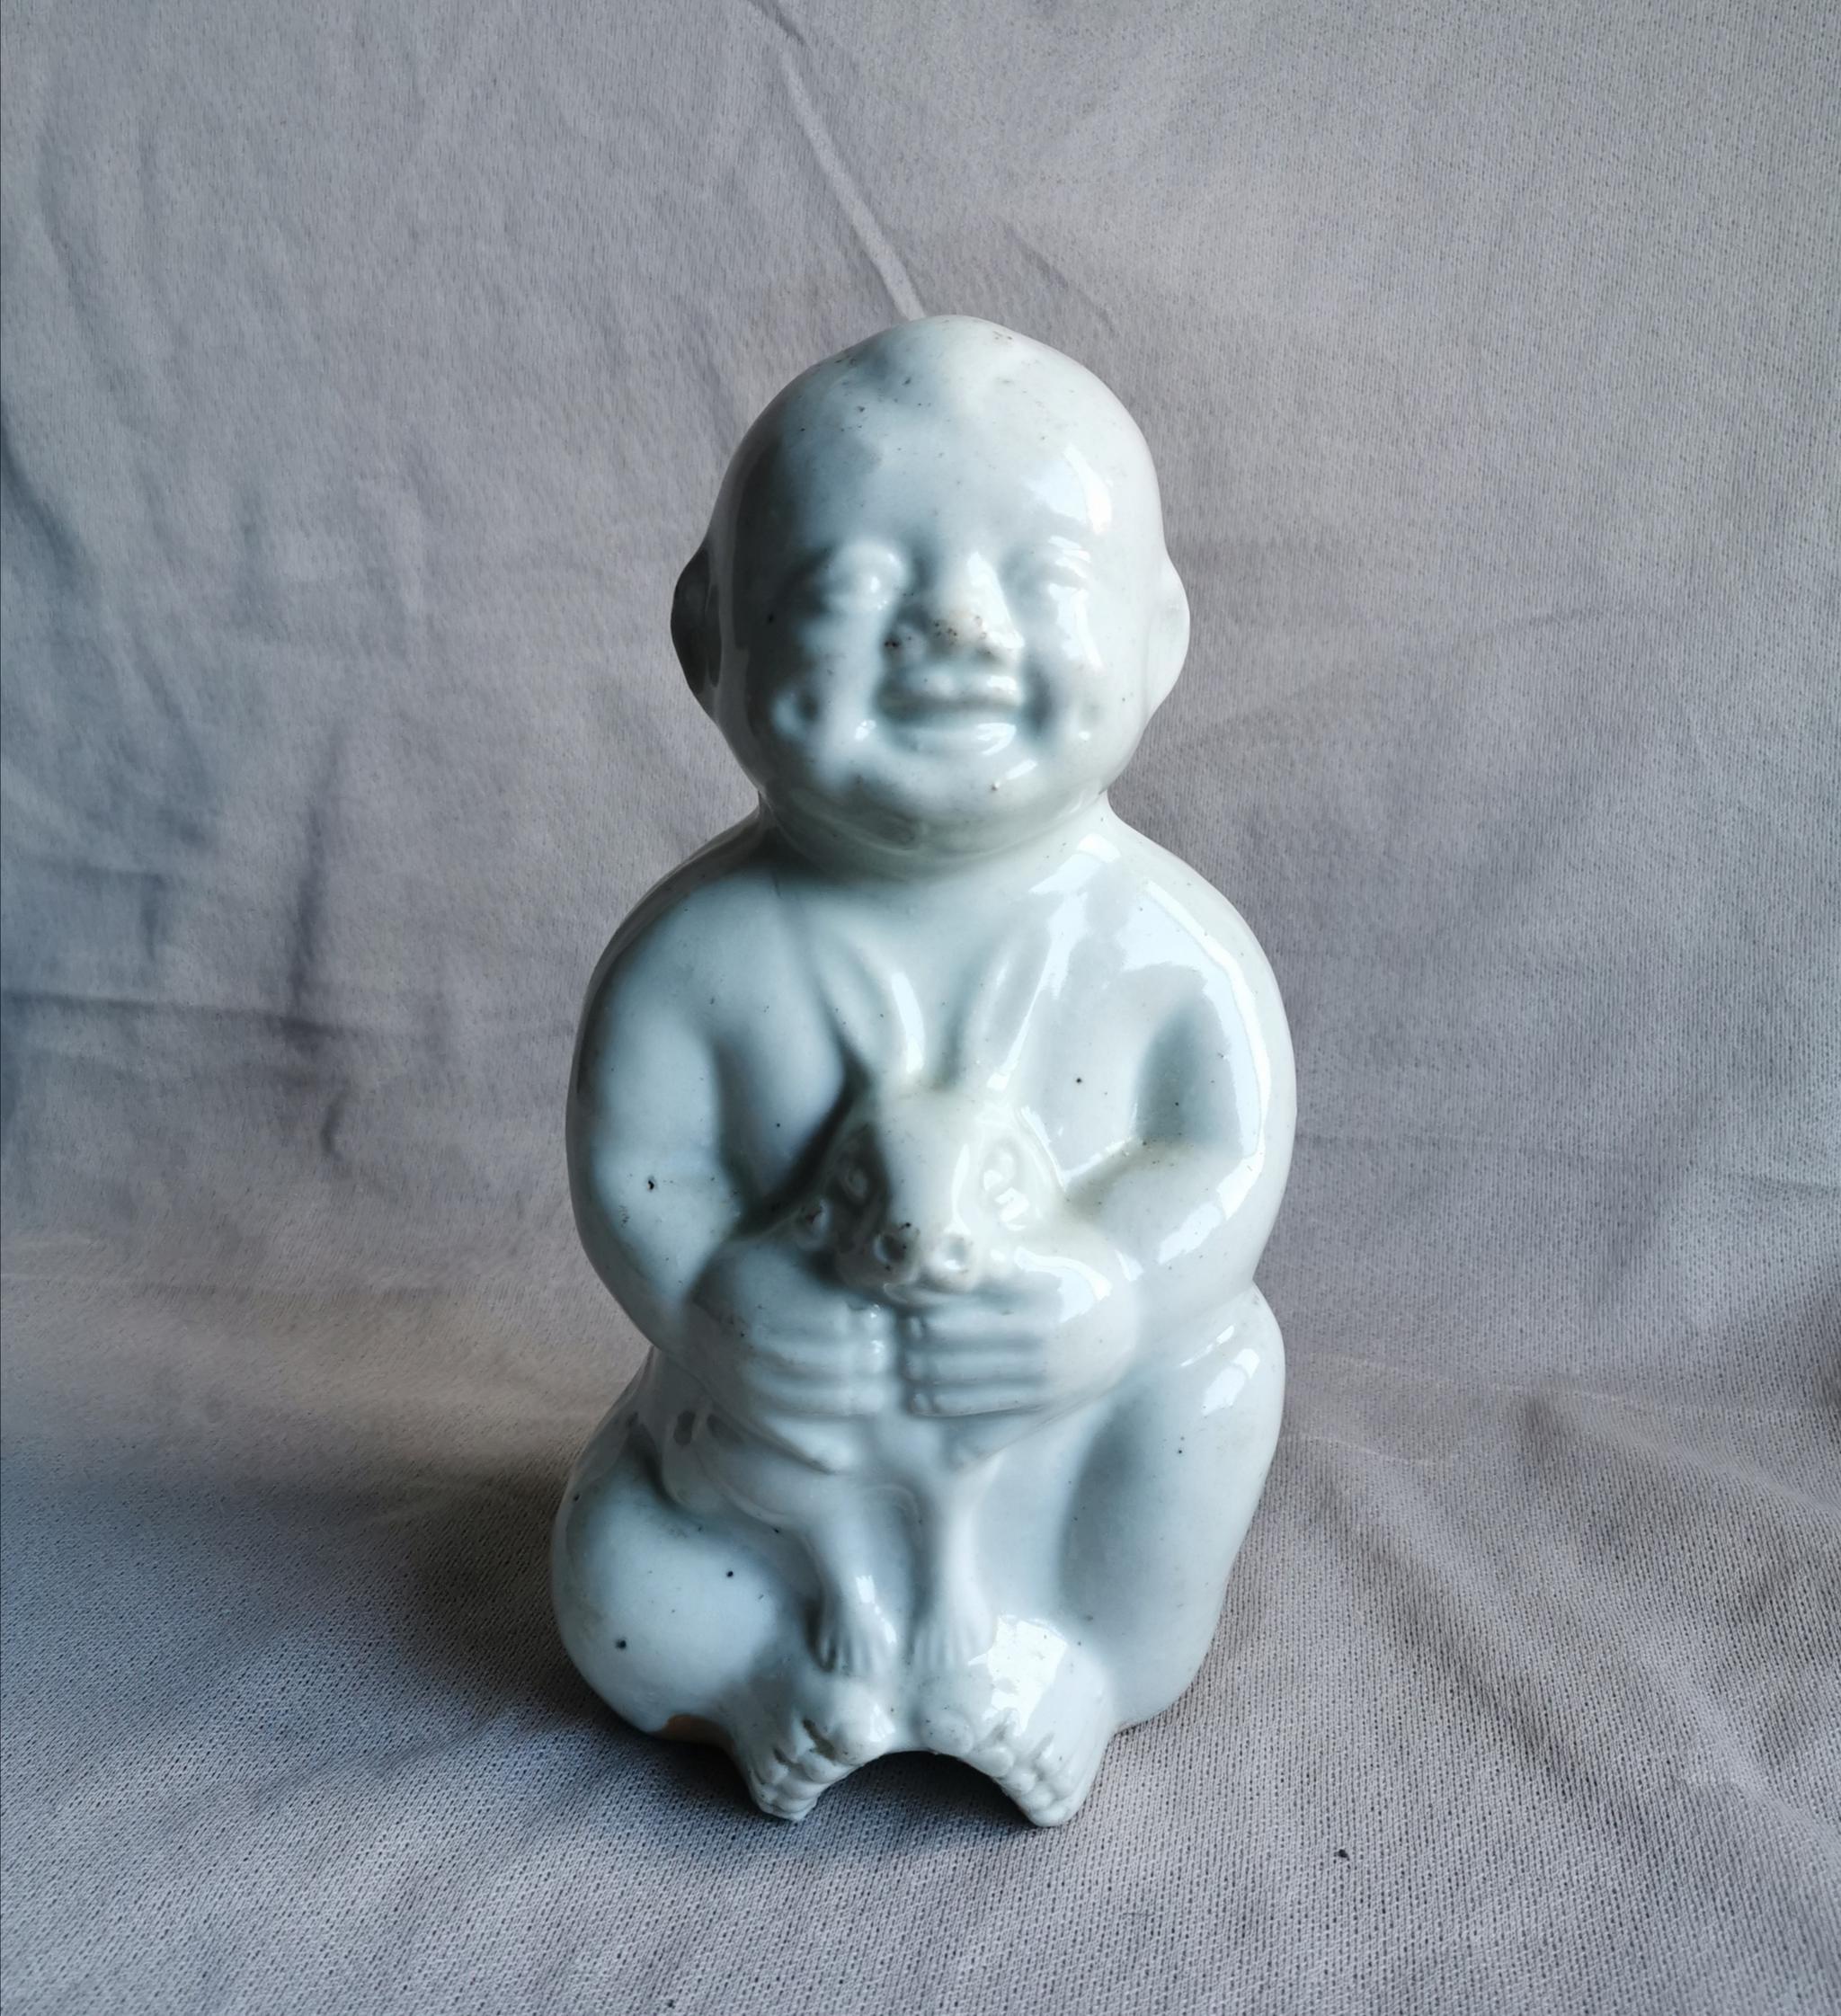 民国白瓷娃娃抱玉兔童子像寓意研究